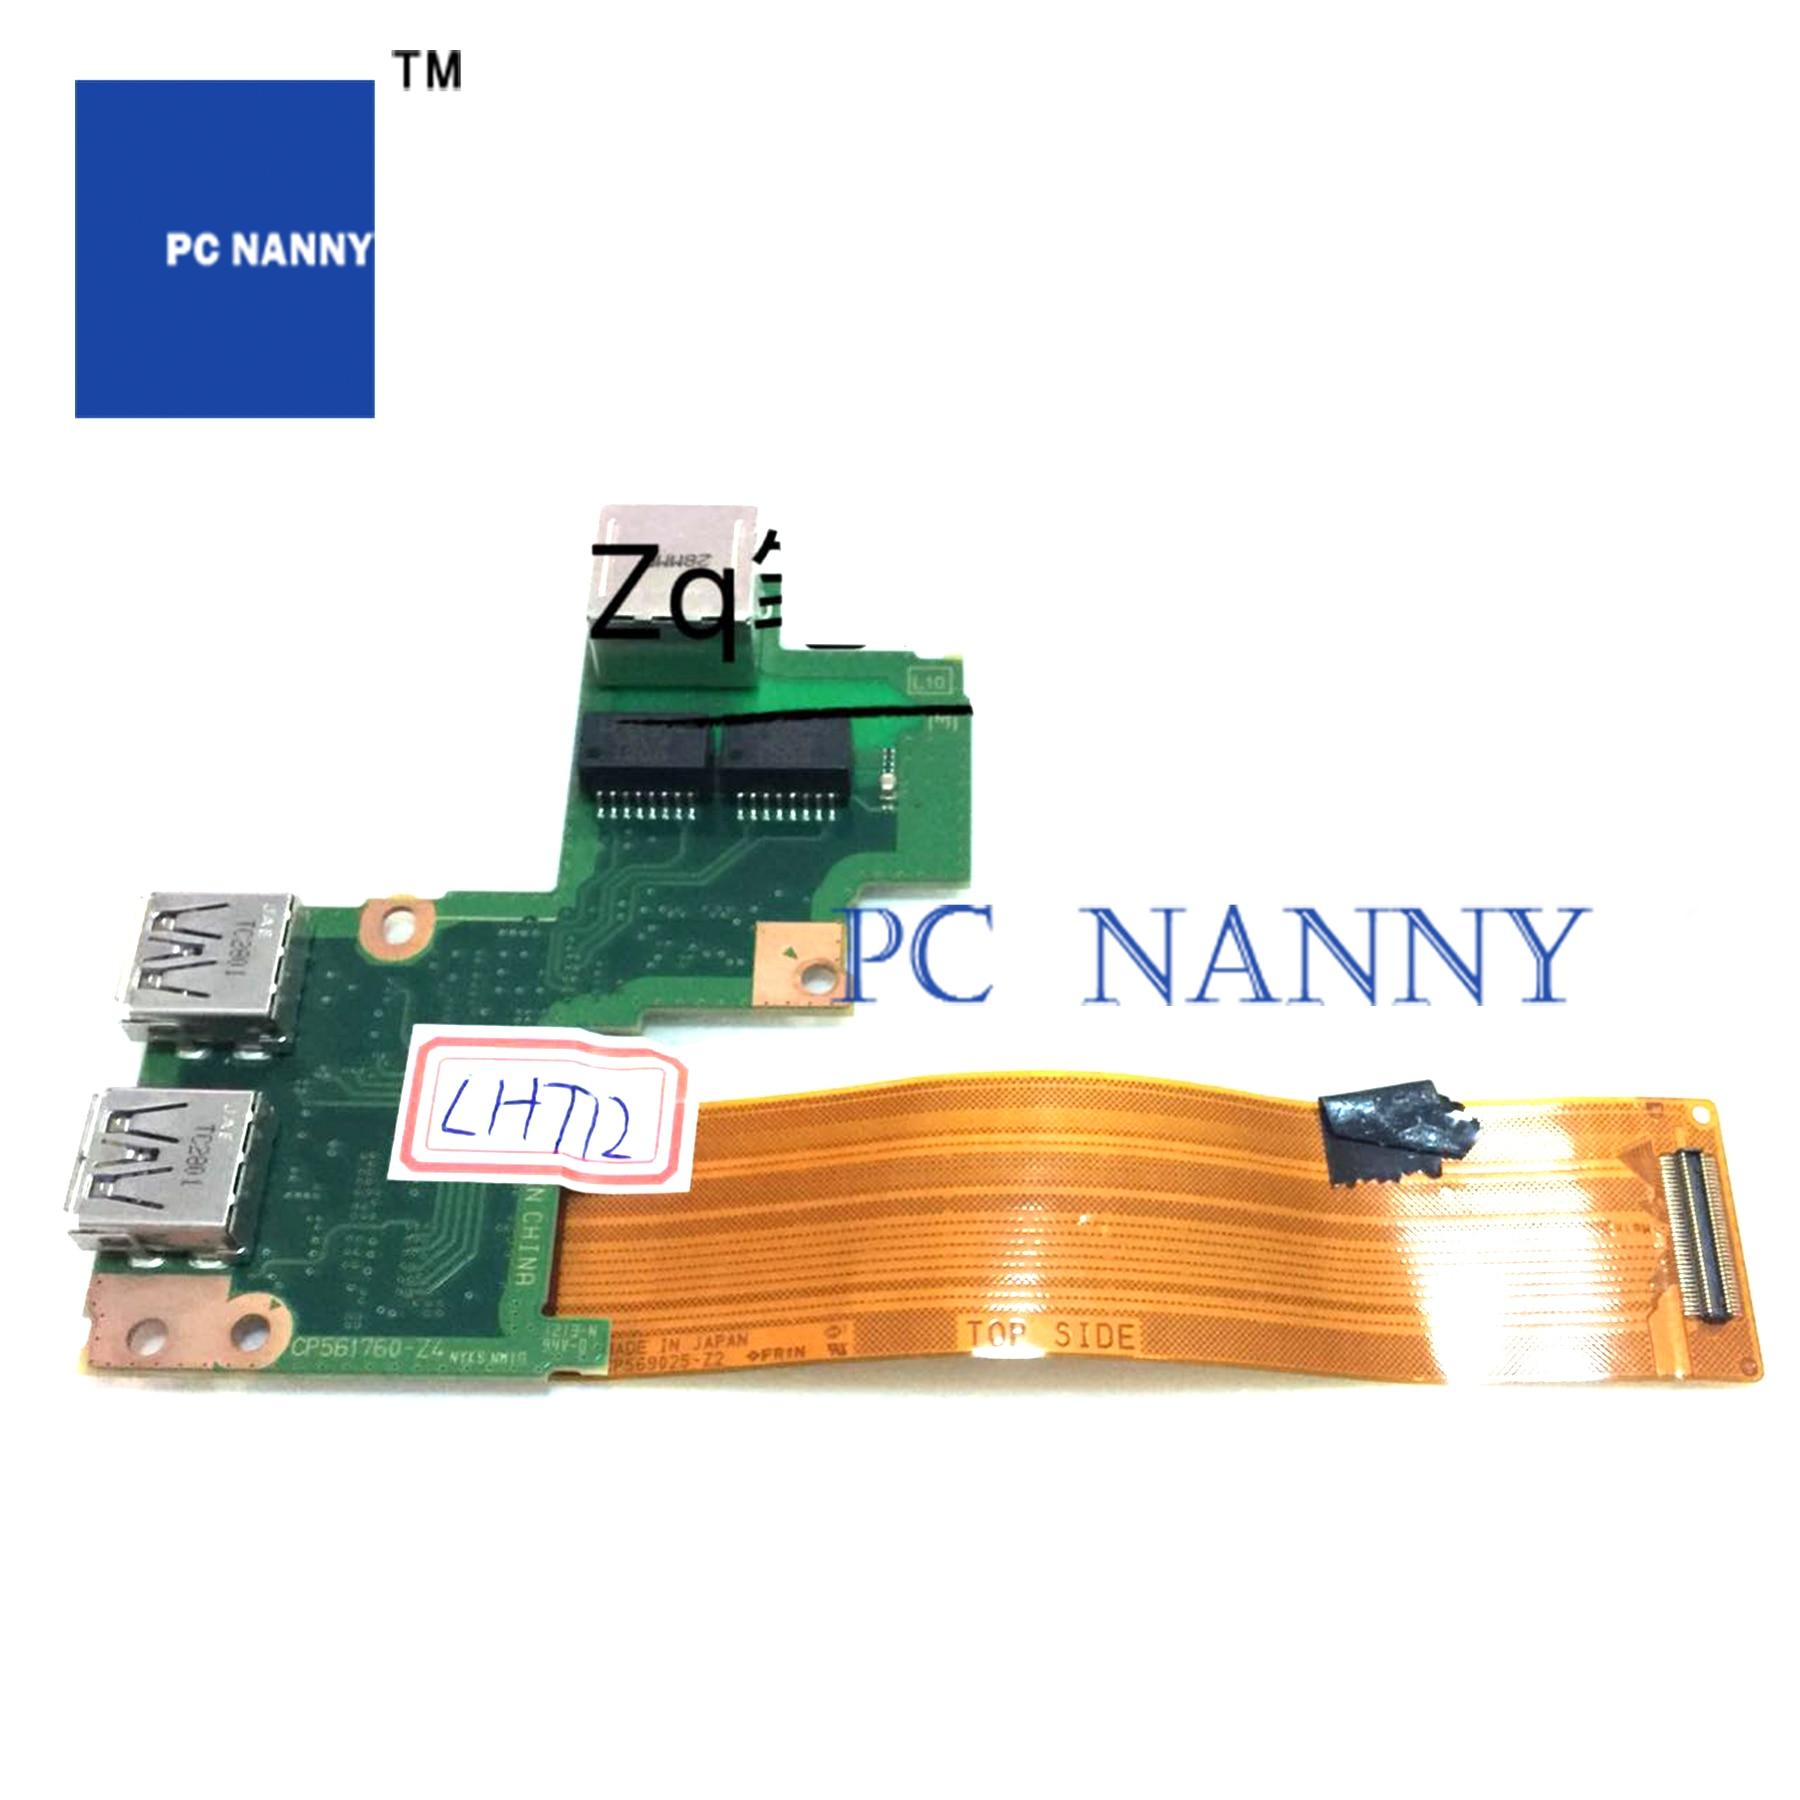 Pcnوالماني لـ Fujitsu LH772 ، usb ، لوحة lan